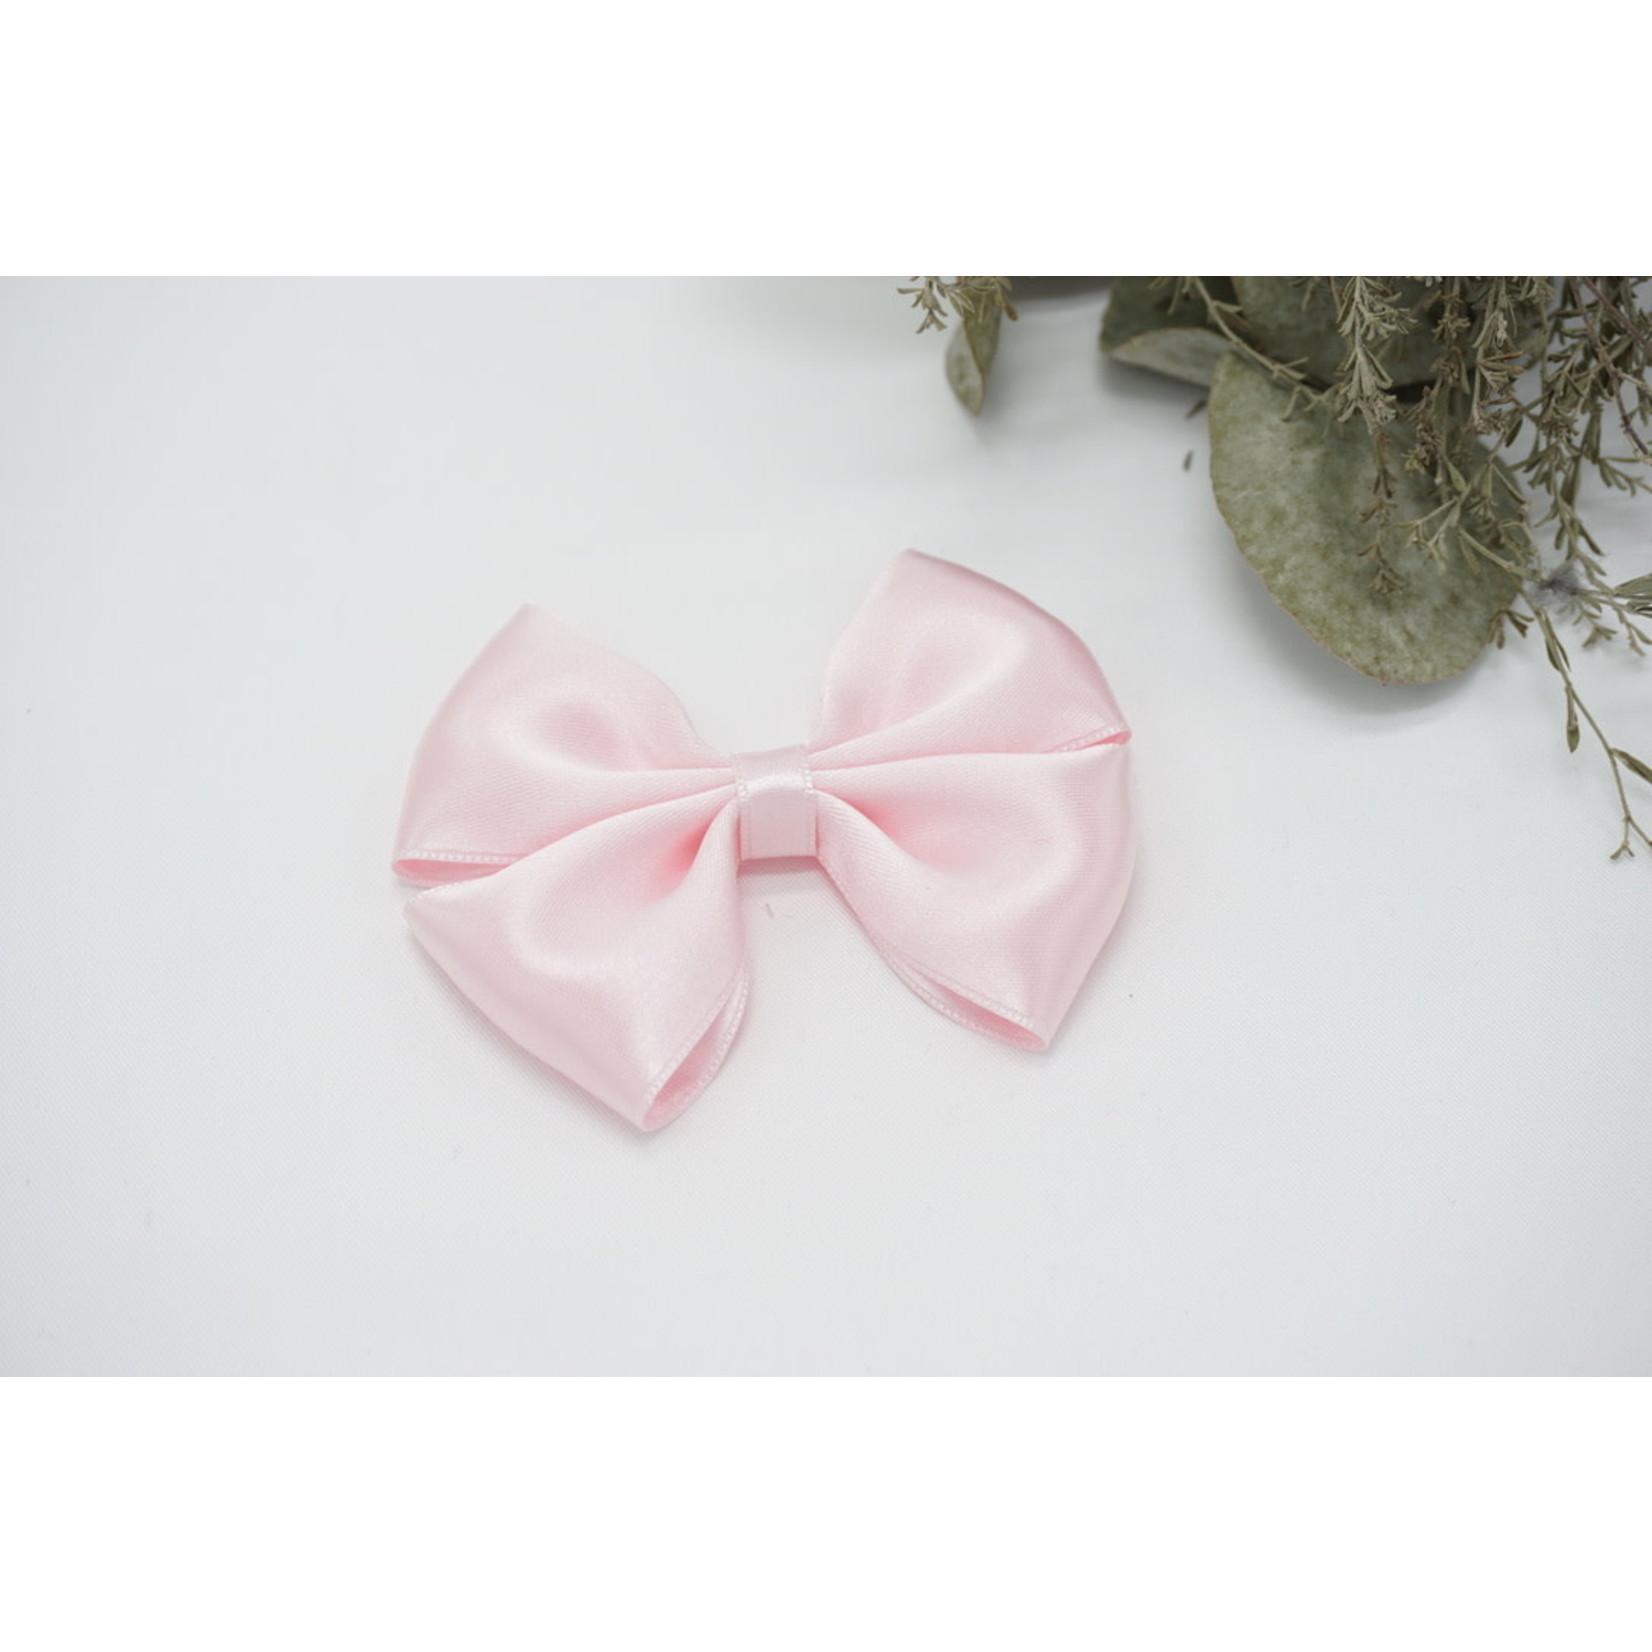 Petite Zara Satin Bow - Princess Pink 1